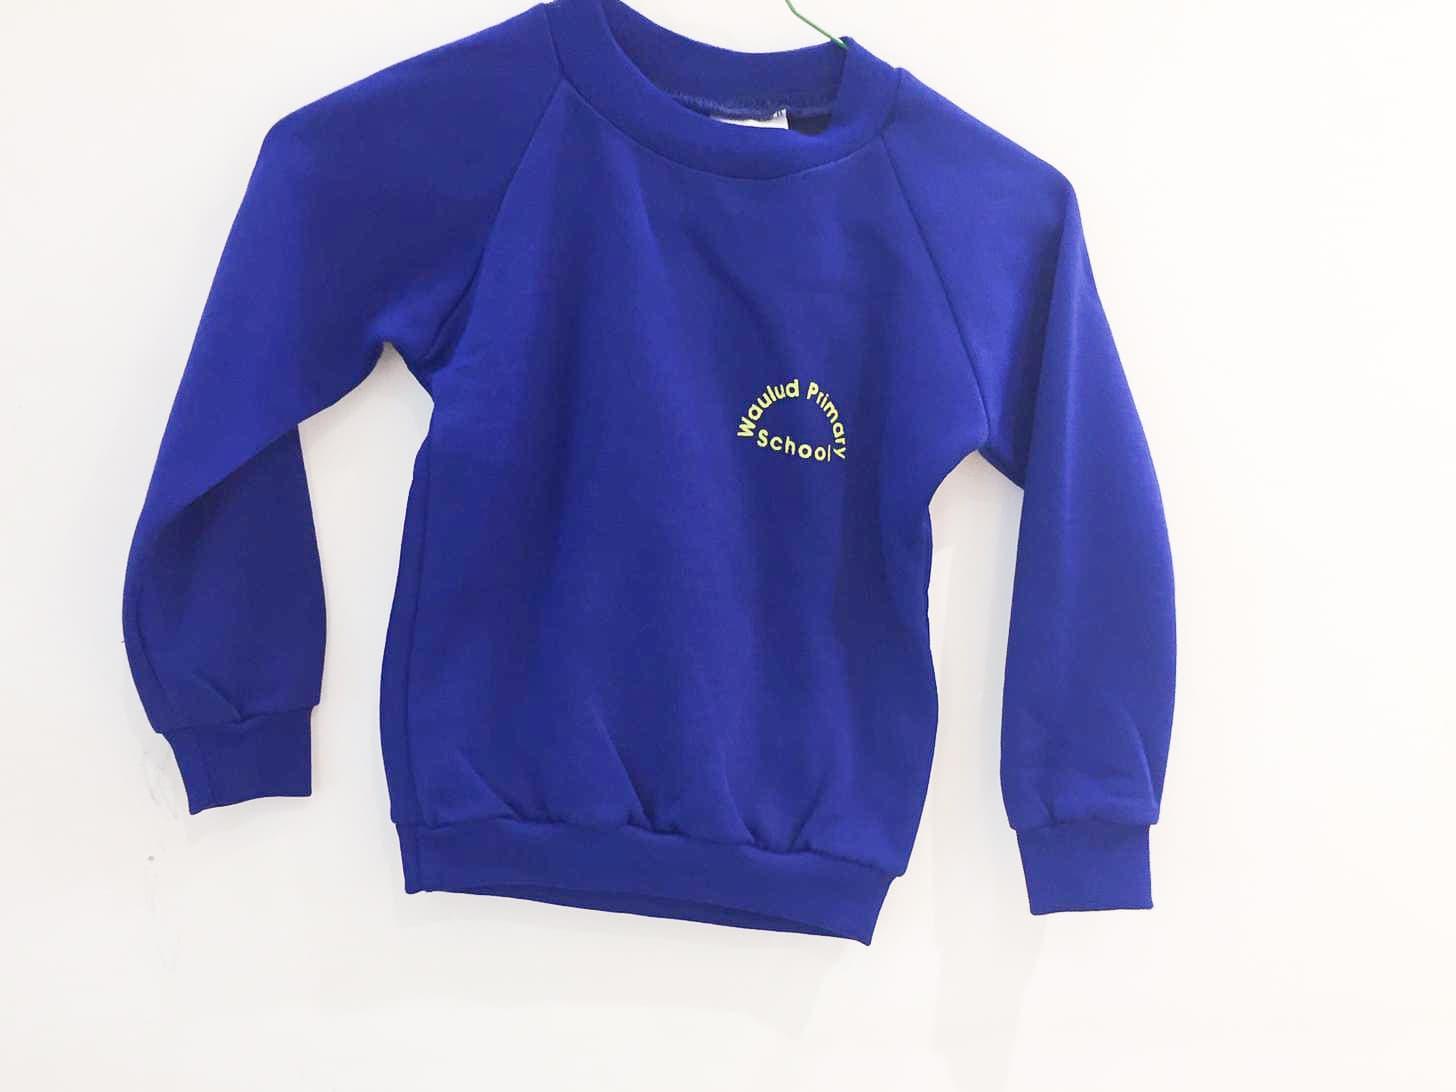 Blue Sweatshirt (old logo)